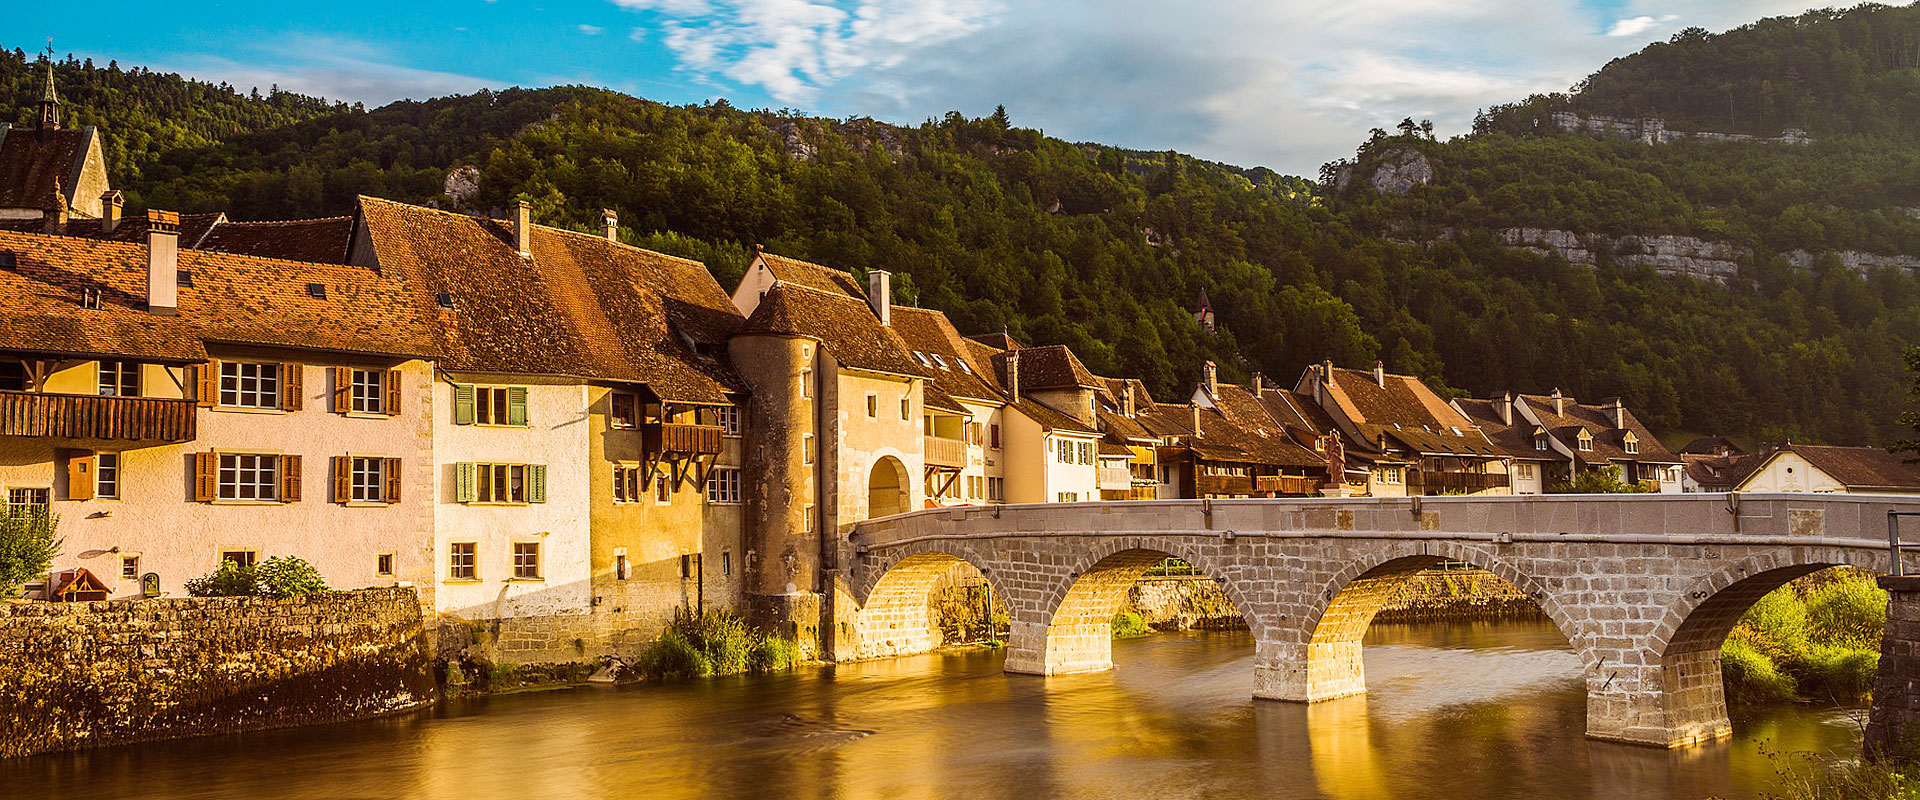 Saint-Ursanne am Ufer des Doubs im Kanton Jura